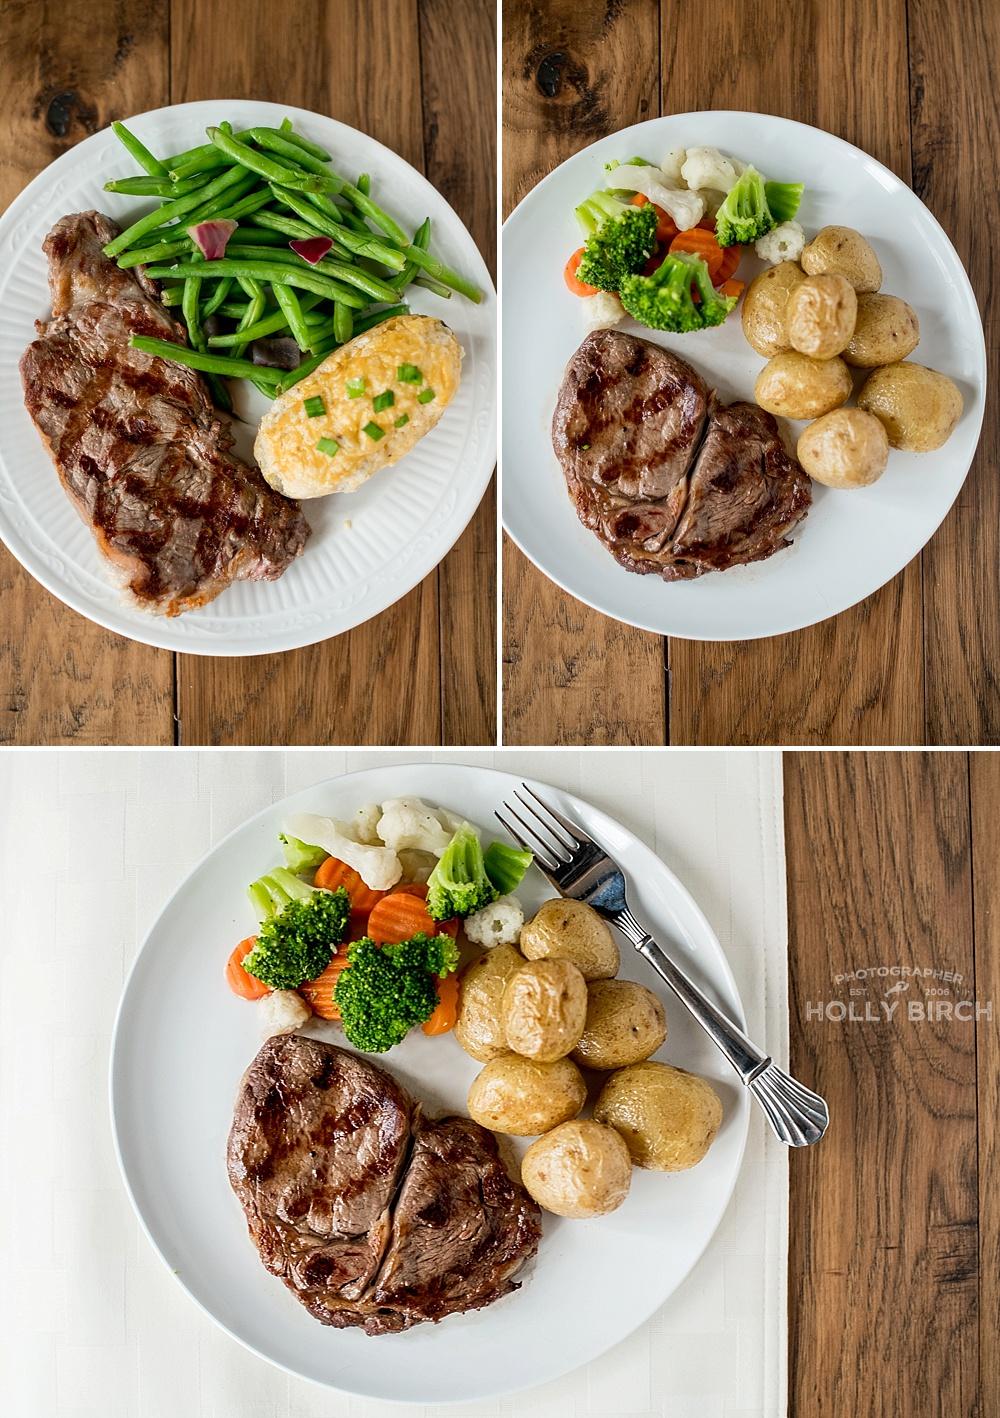 freezer-beef-steaks-burgers-Summer-Point-Beef-food-photographer_4247.jpg